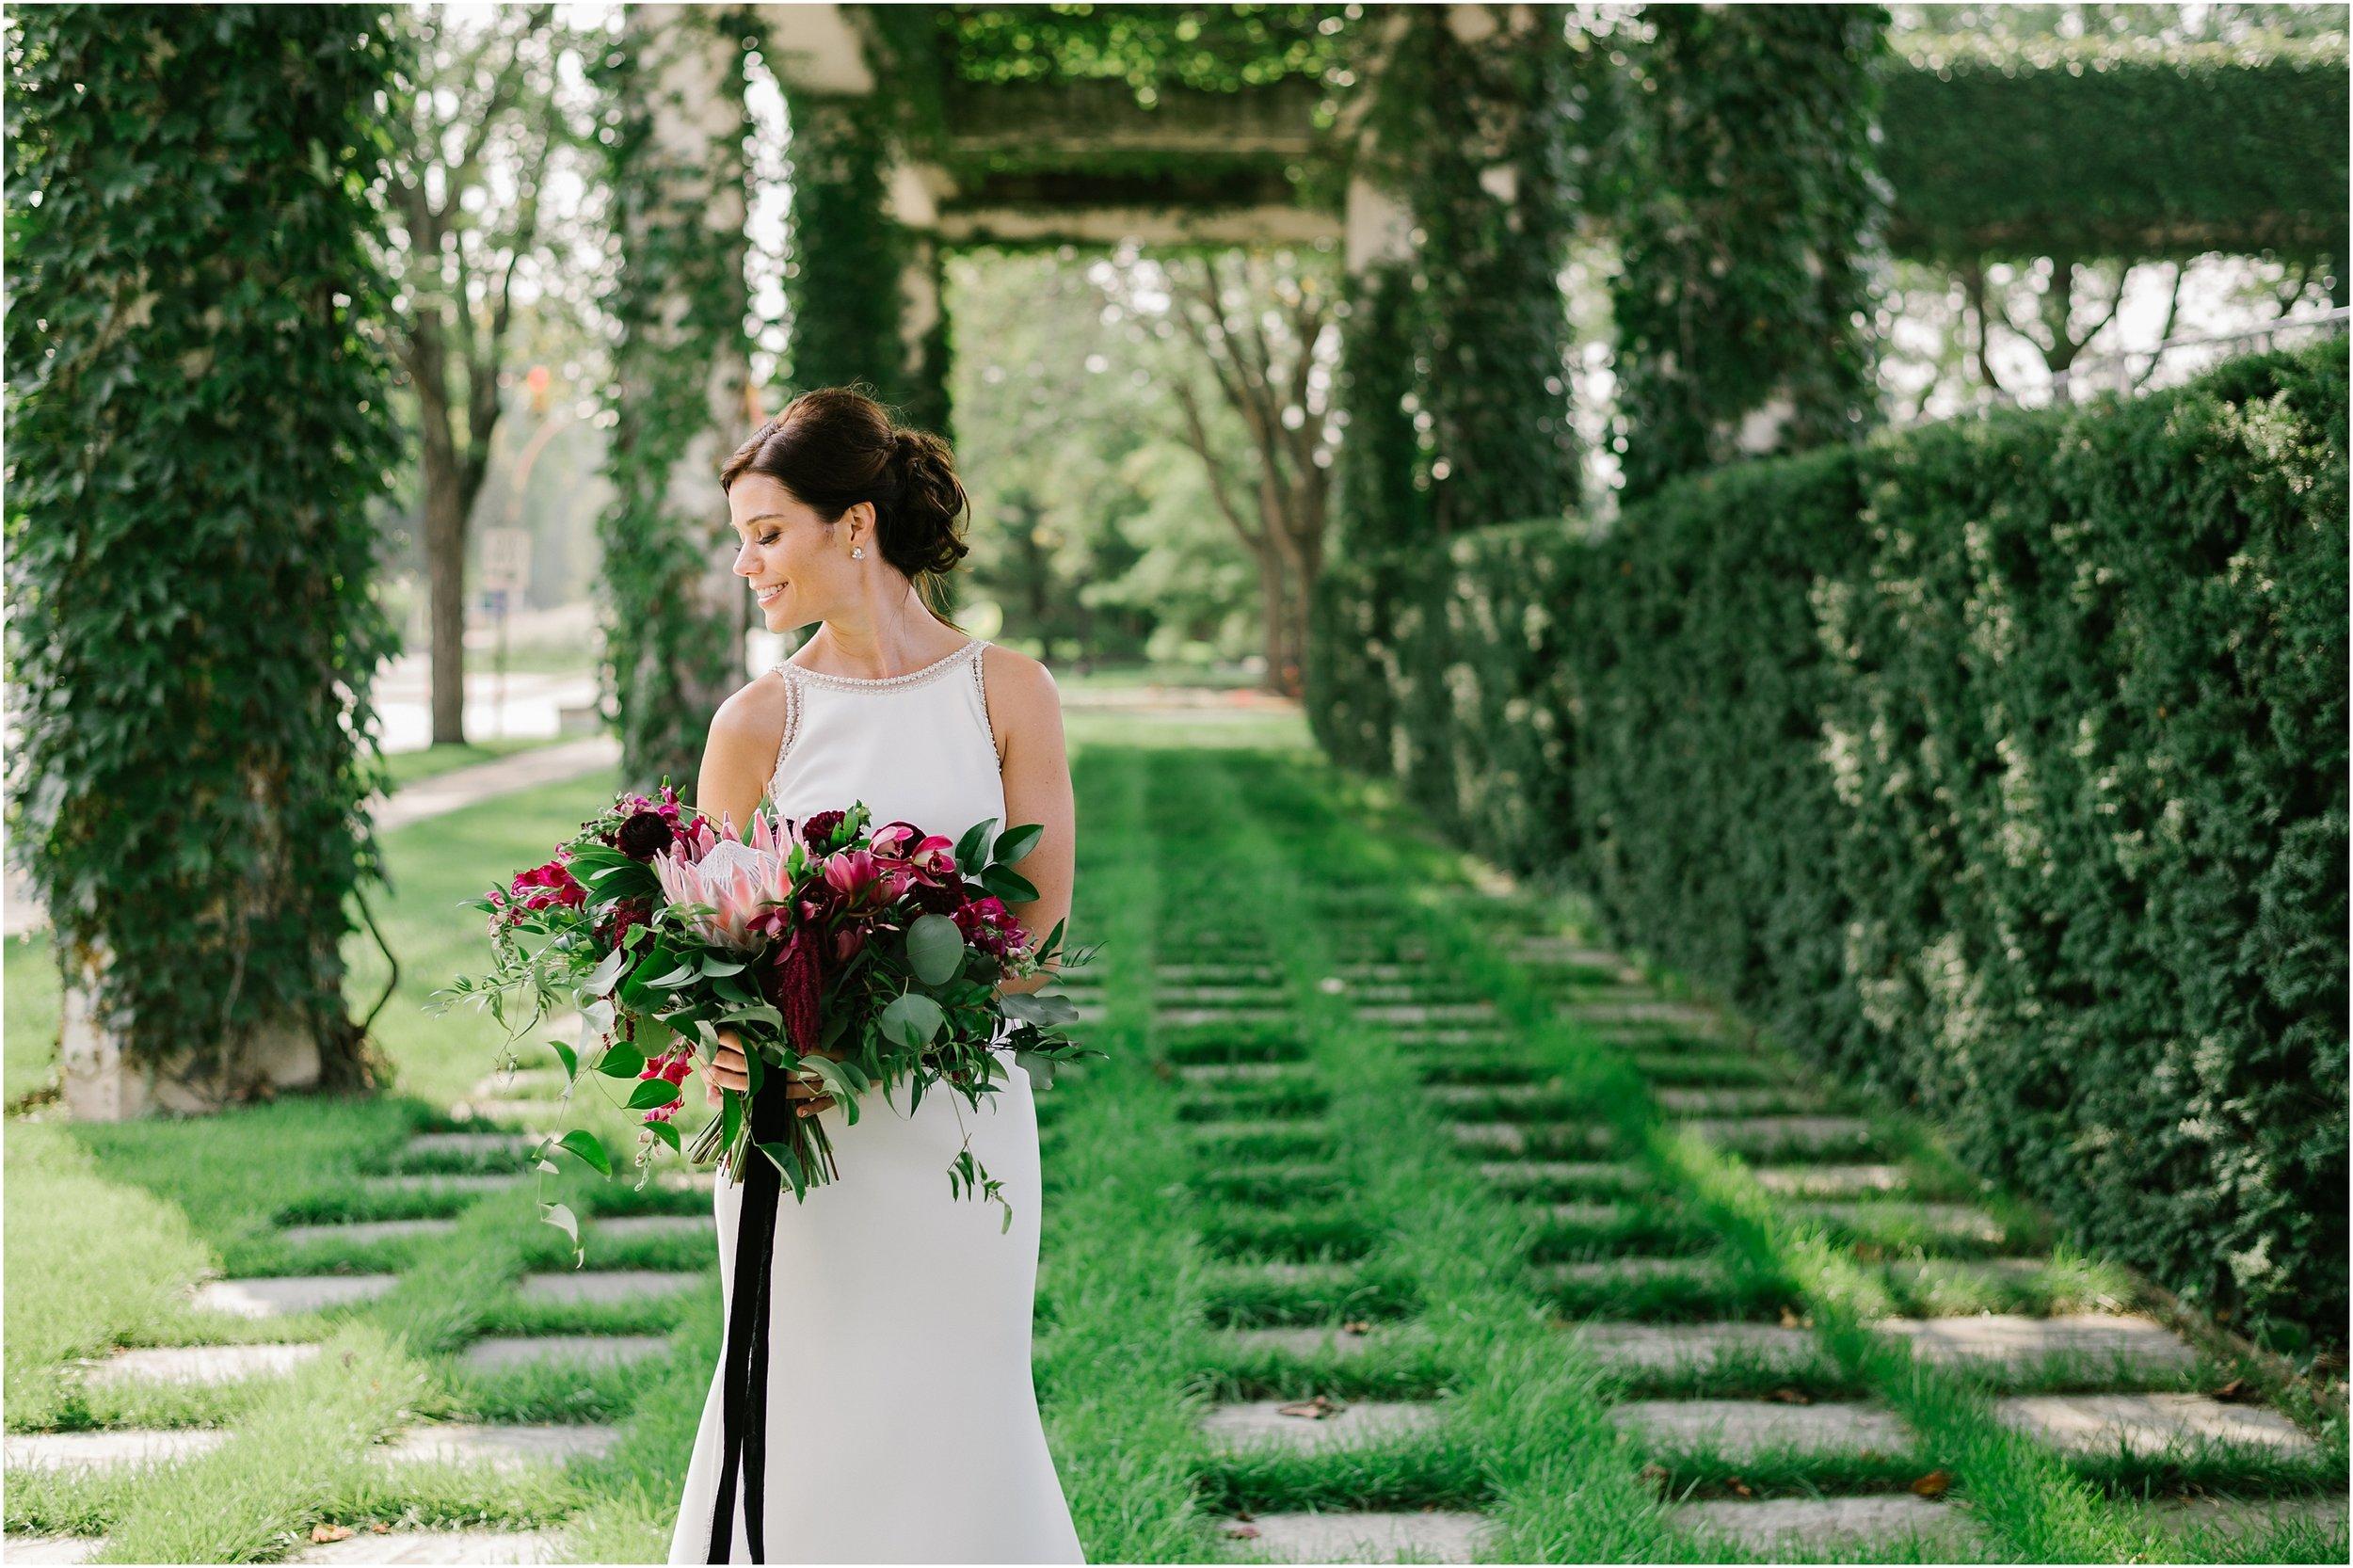 Rebecca_Shehorn_Photography_Indianapolis Wedding Photographer Sycamore at Mallow Run Wedding_9740.jpg